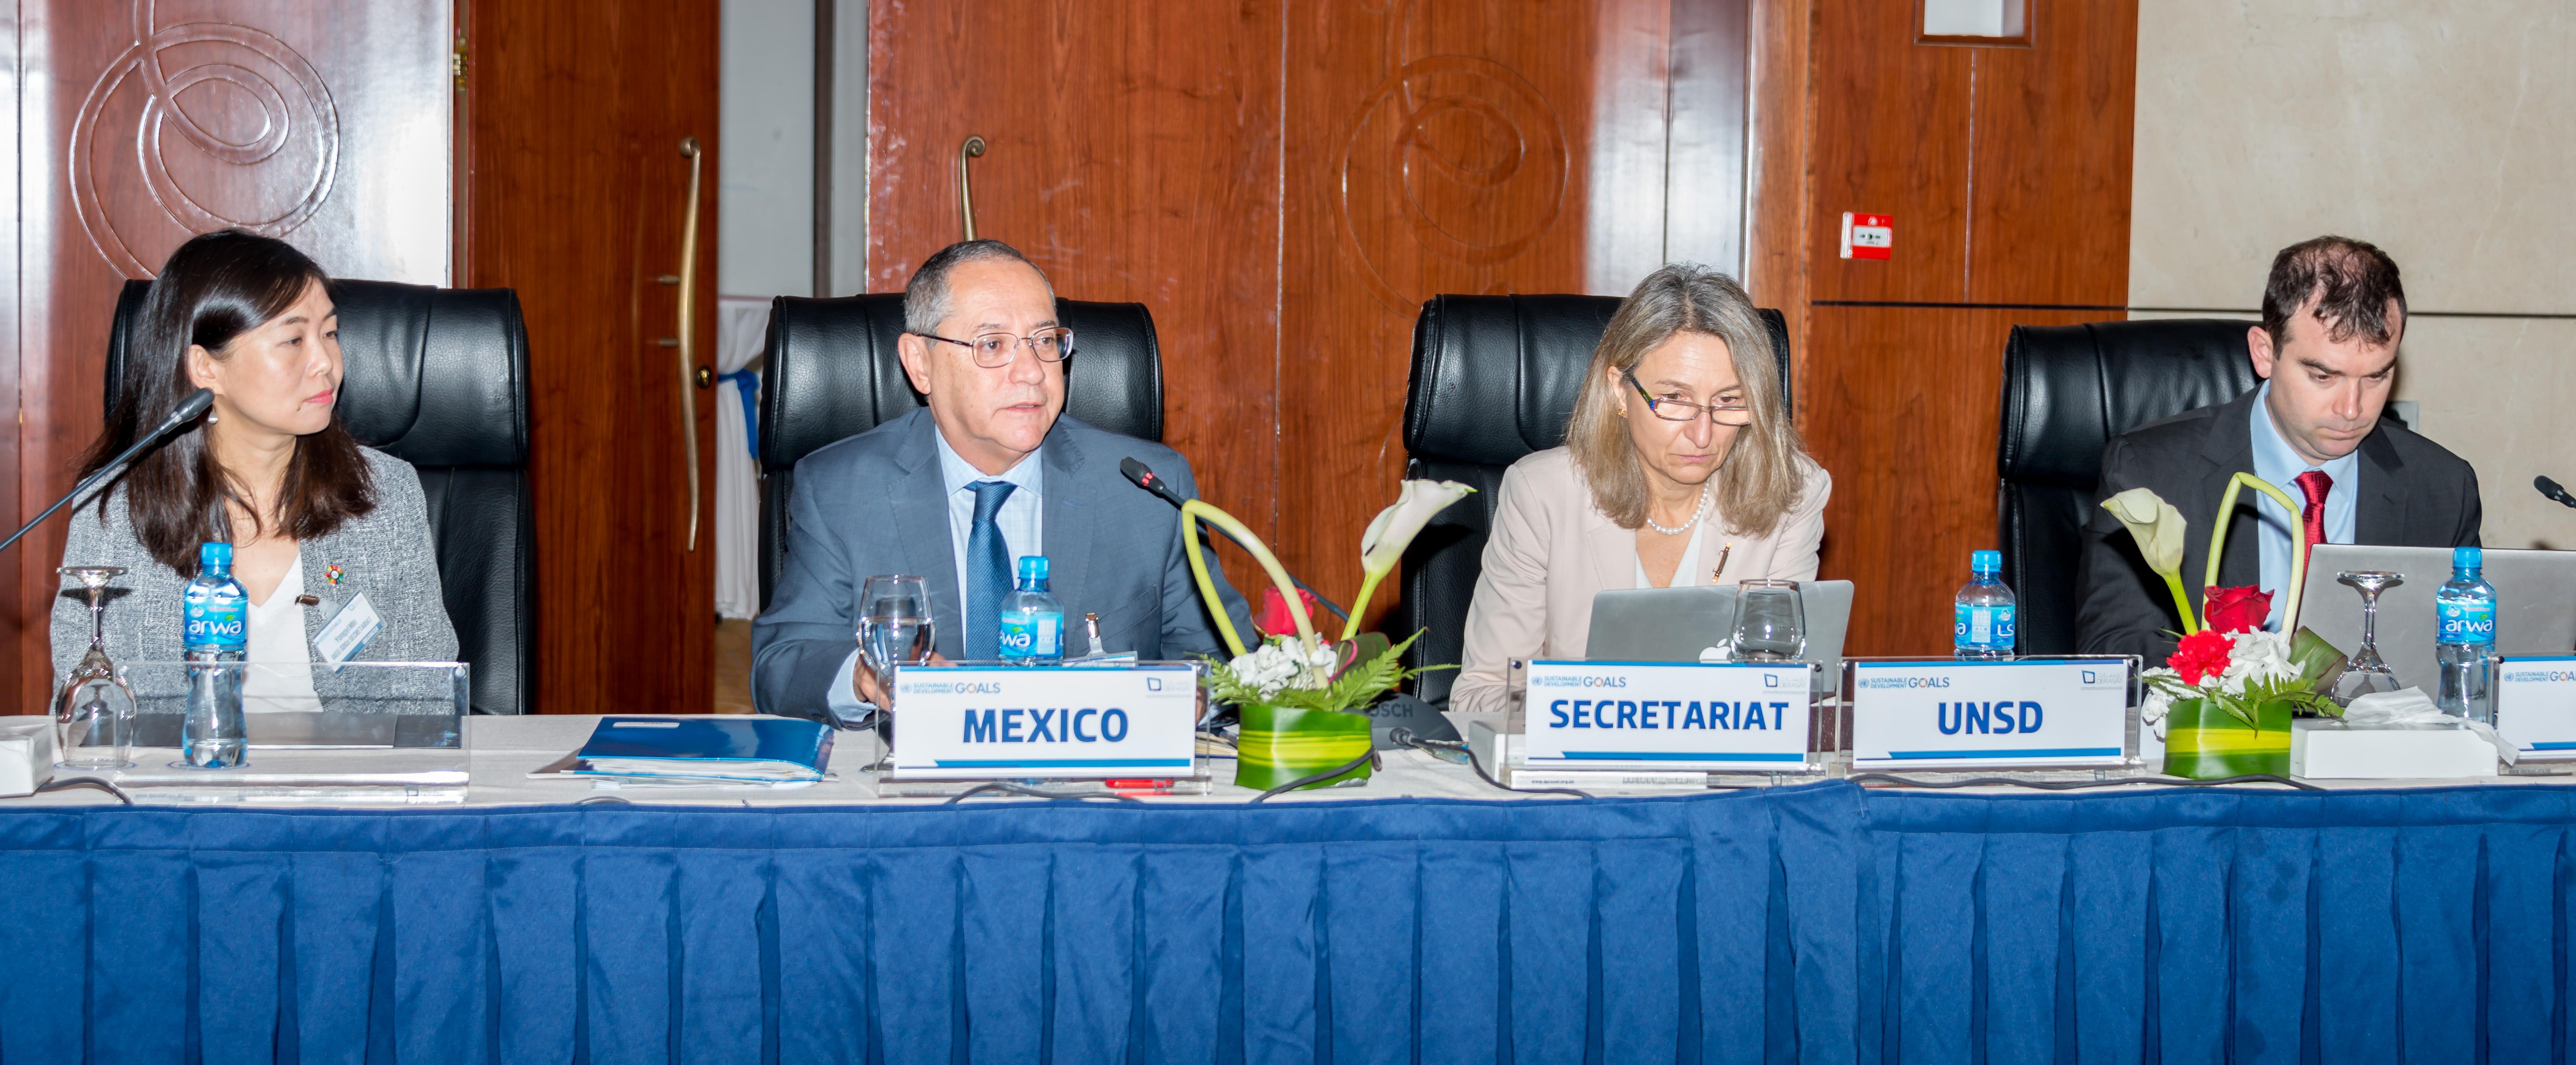 UN Meeting: International Committee of Experts on Indicators of Sustainable Development Goals 2030